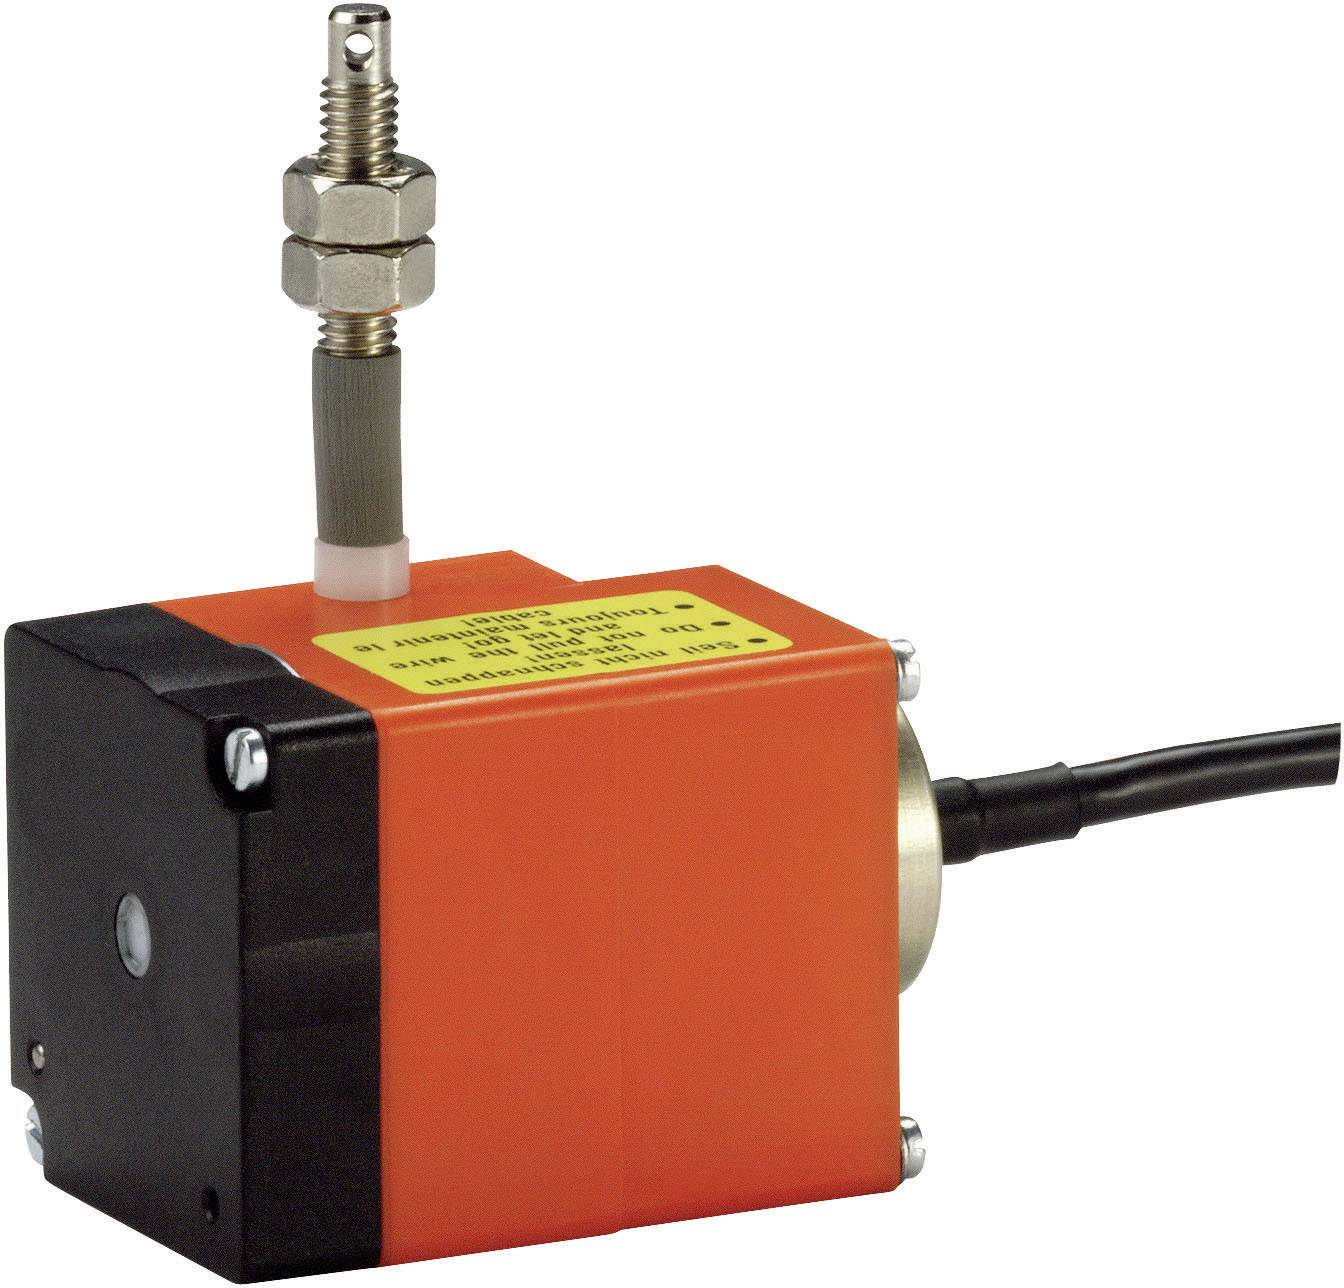 Mini ovládaný snímač Kübler D5, 10 kΩ